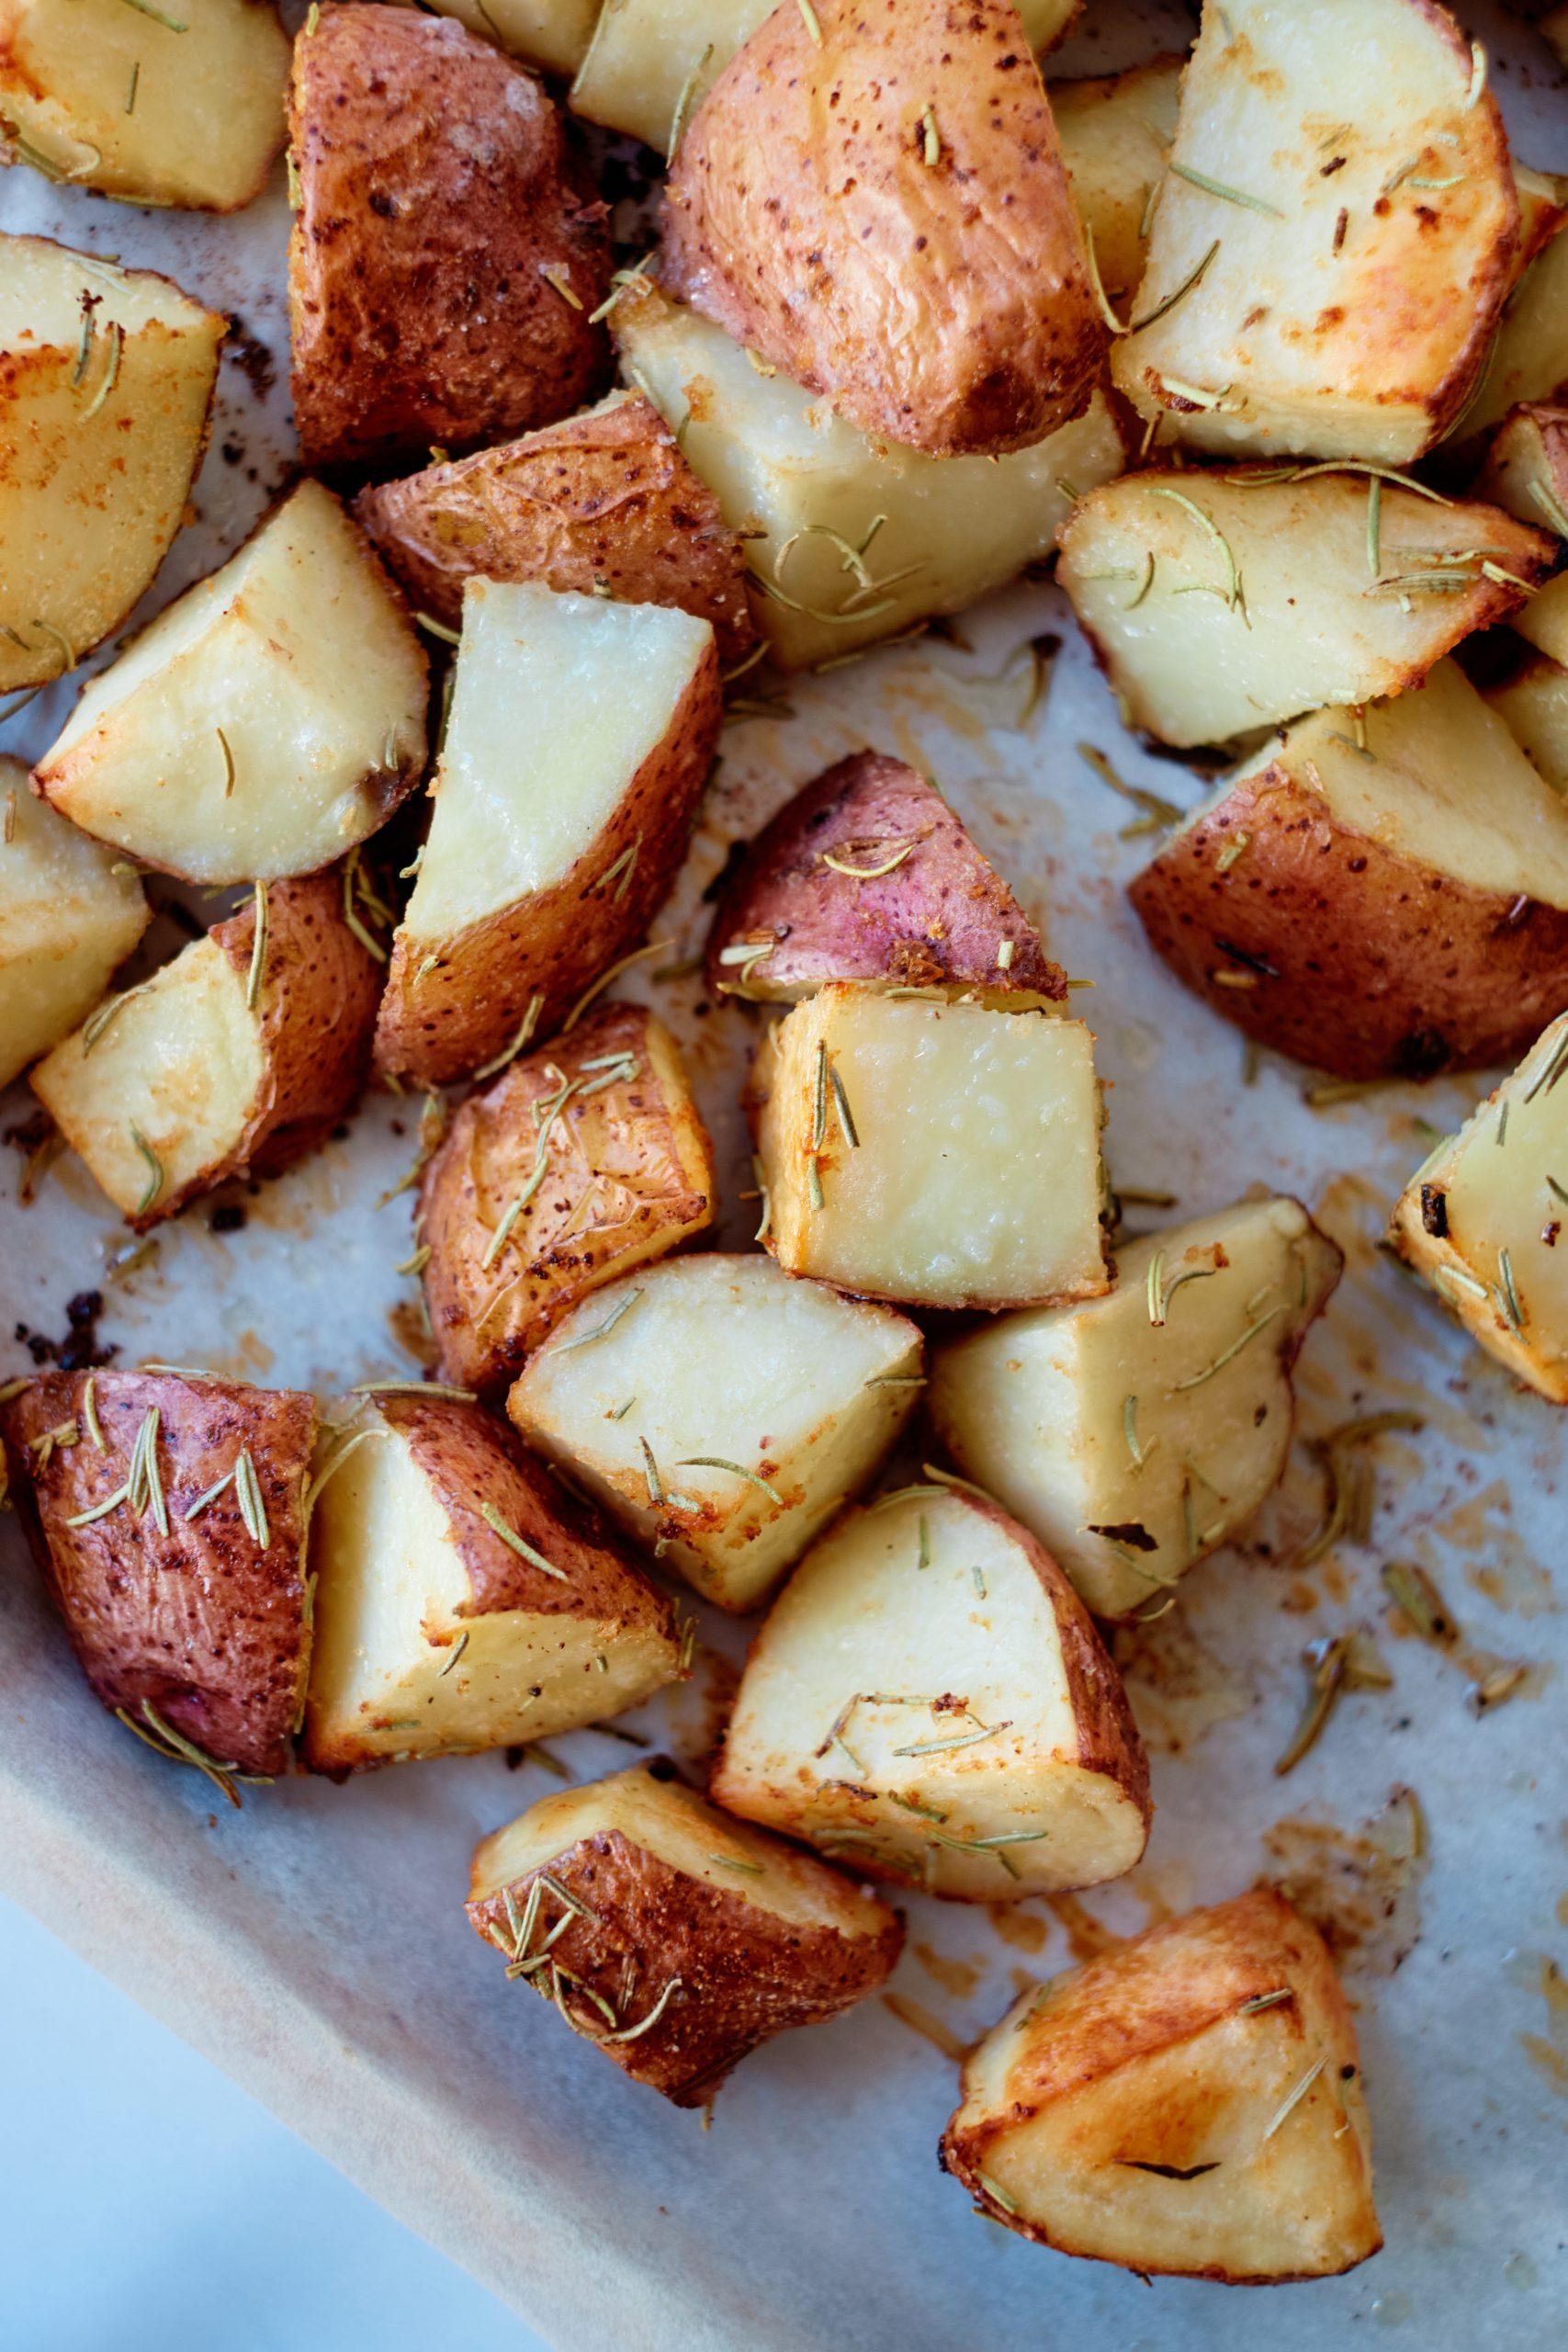 potato chunks on a baking sheet